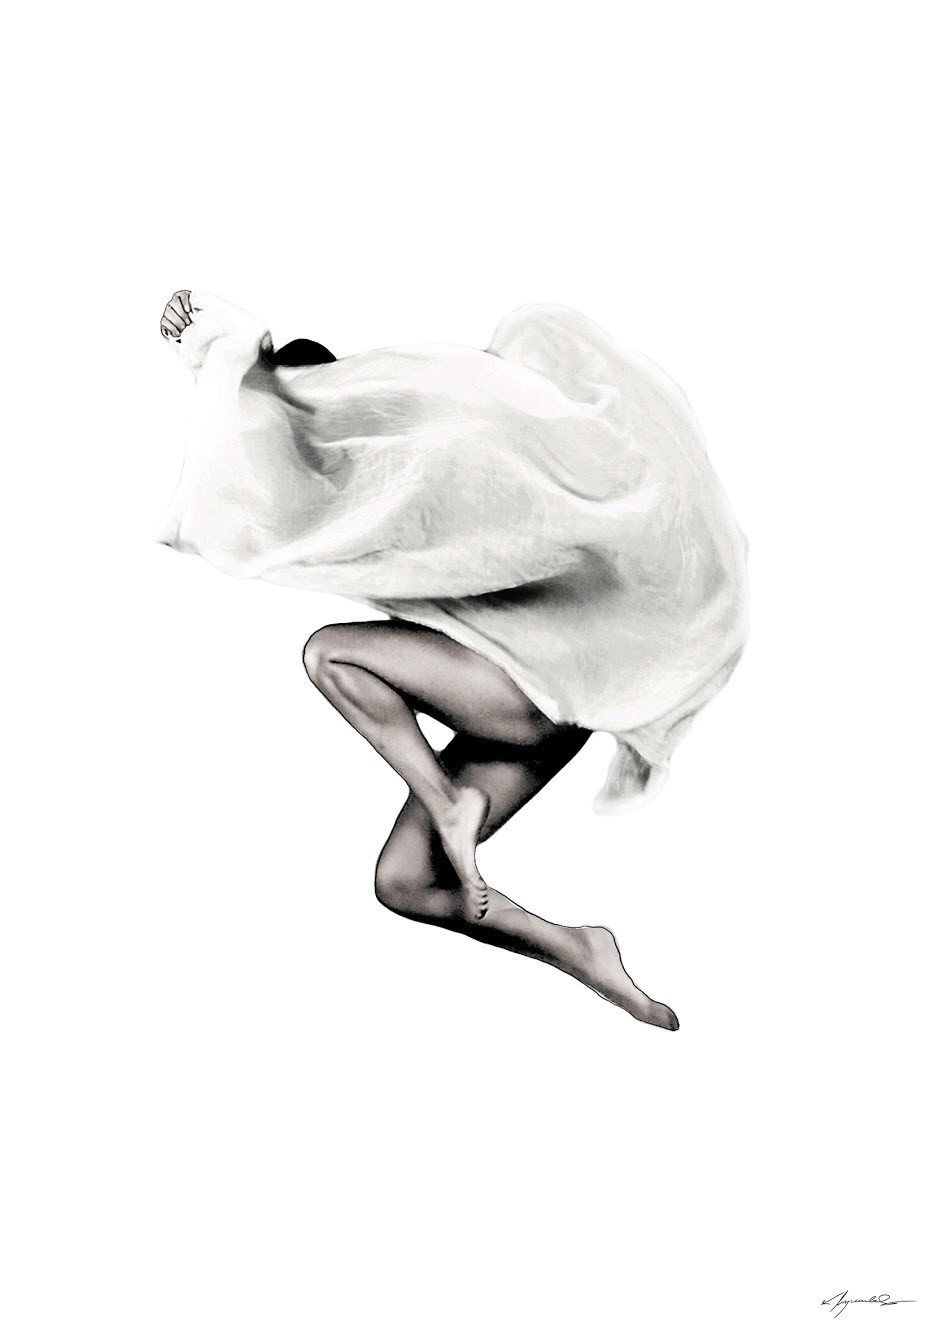 Kate Wyrembelska - Swimmers - photographics